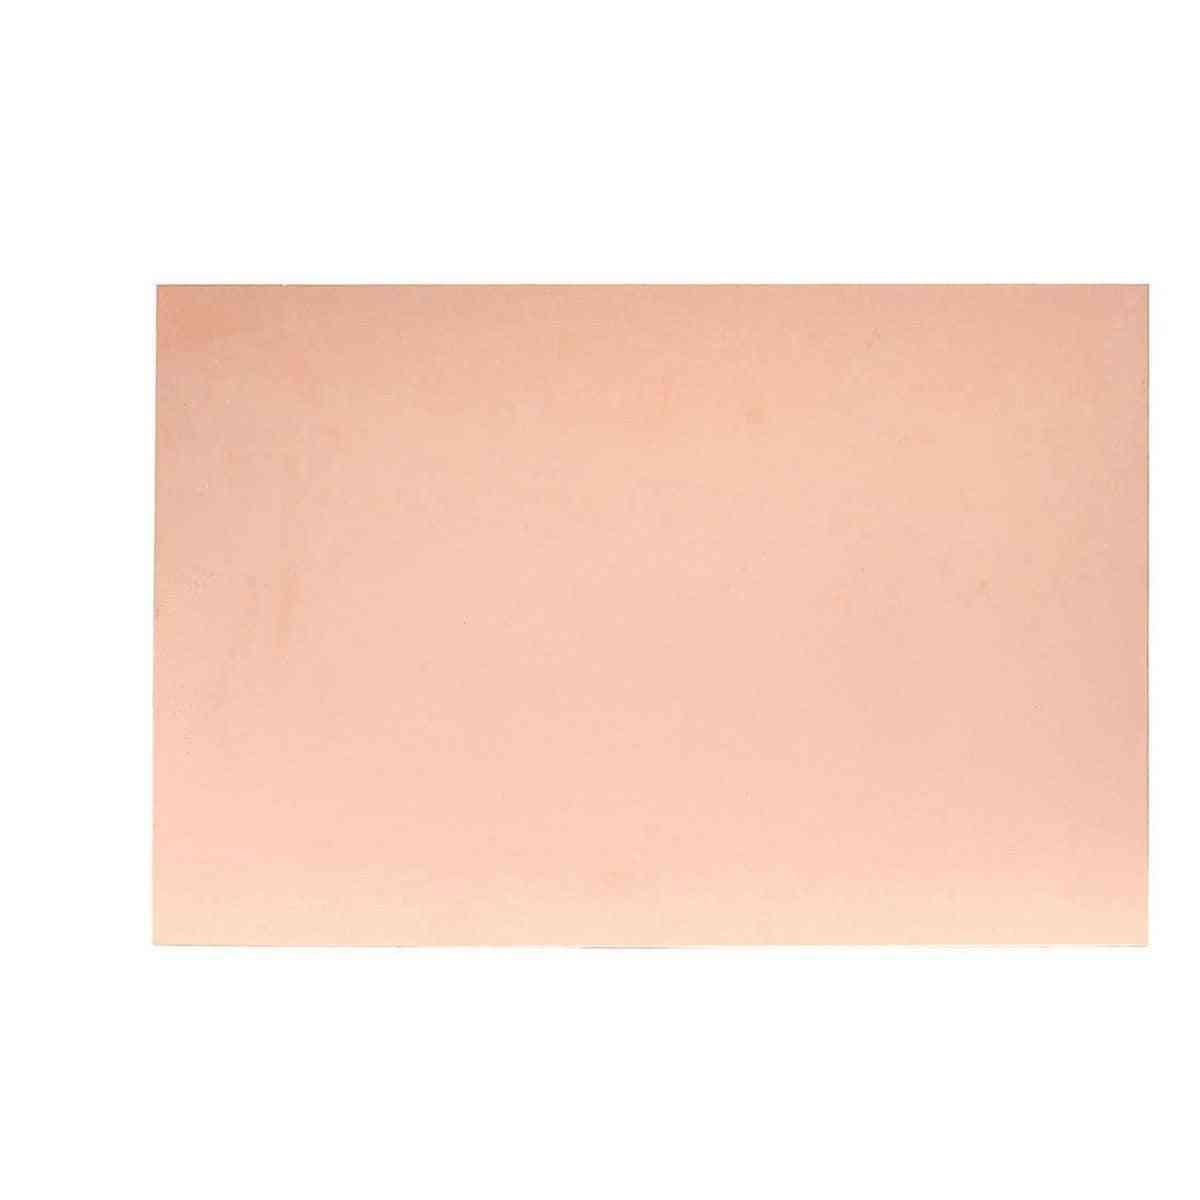 Fr4 Double Side Copper Clad Laminate